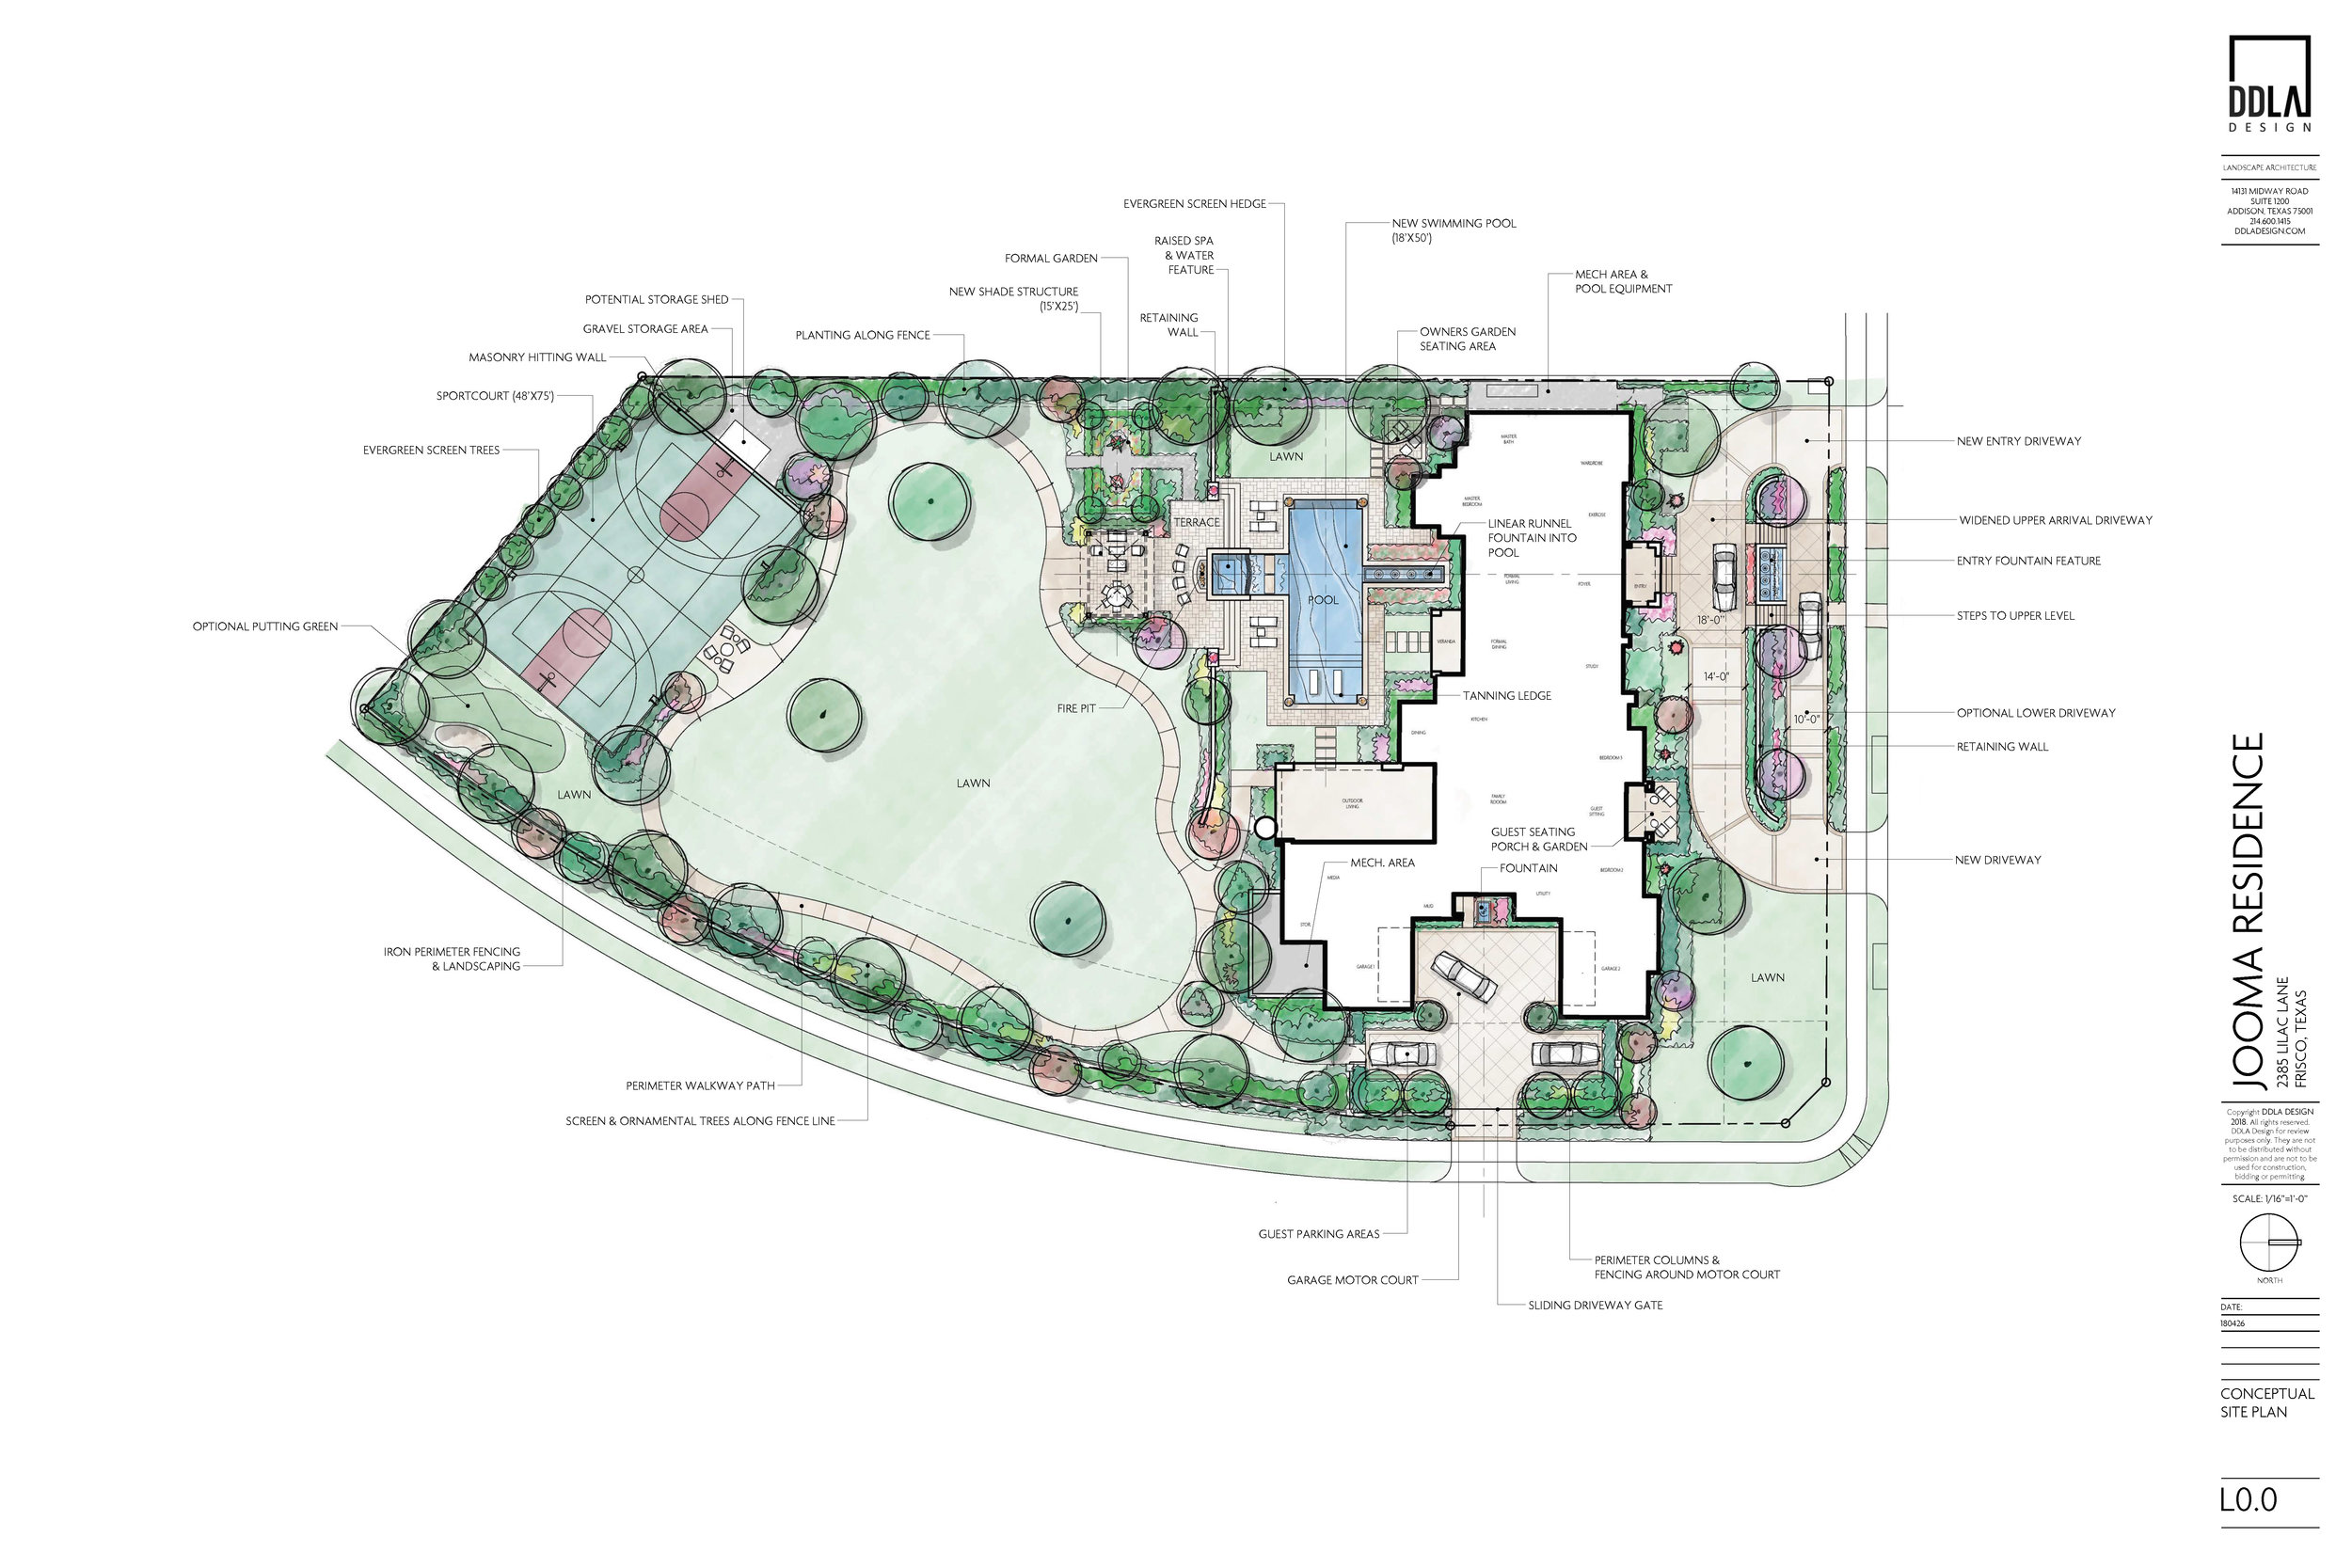 180426 jooma_conceptual plan.jpg